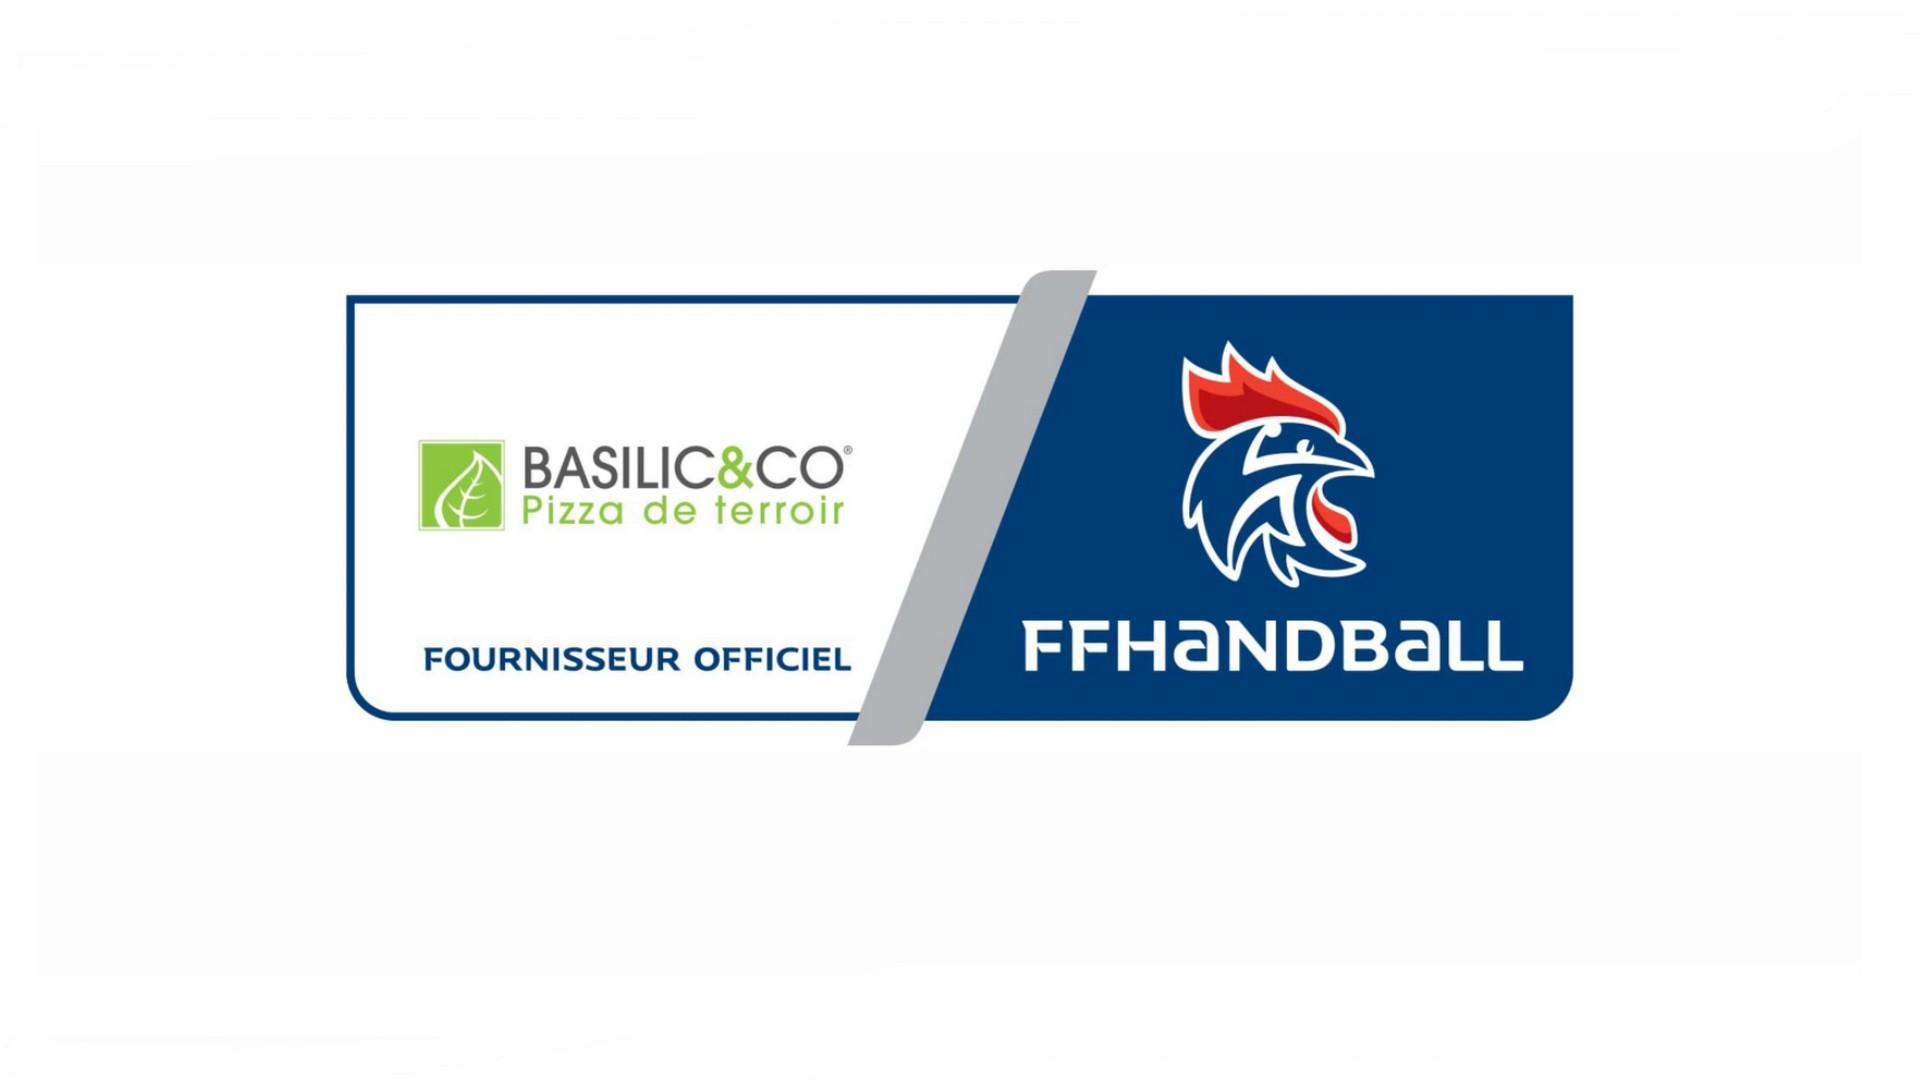 Basilic and Co x FFHB (handball) 2021